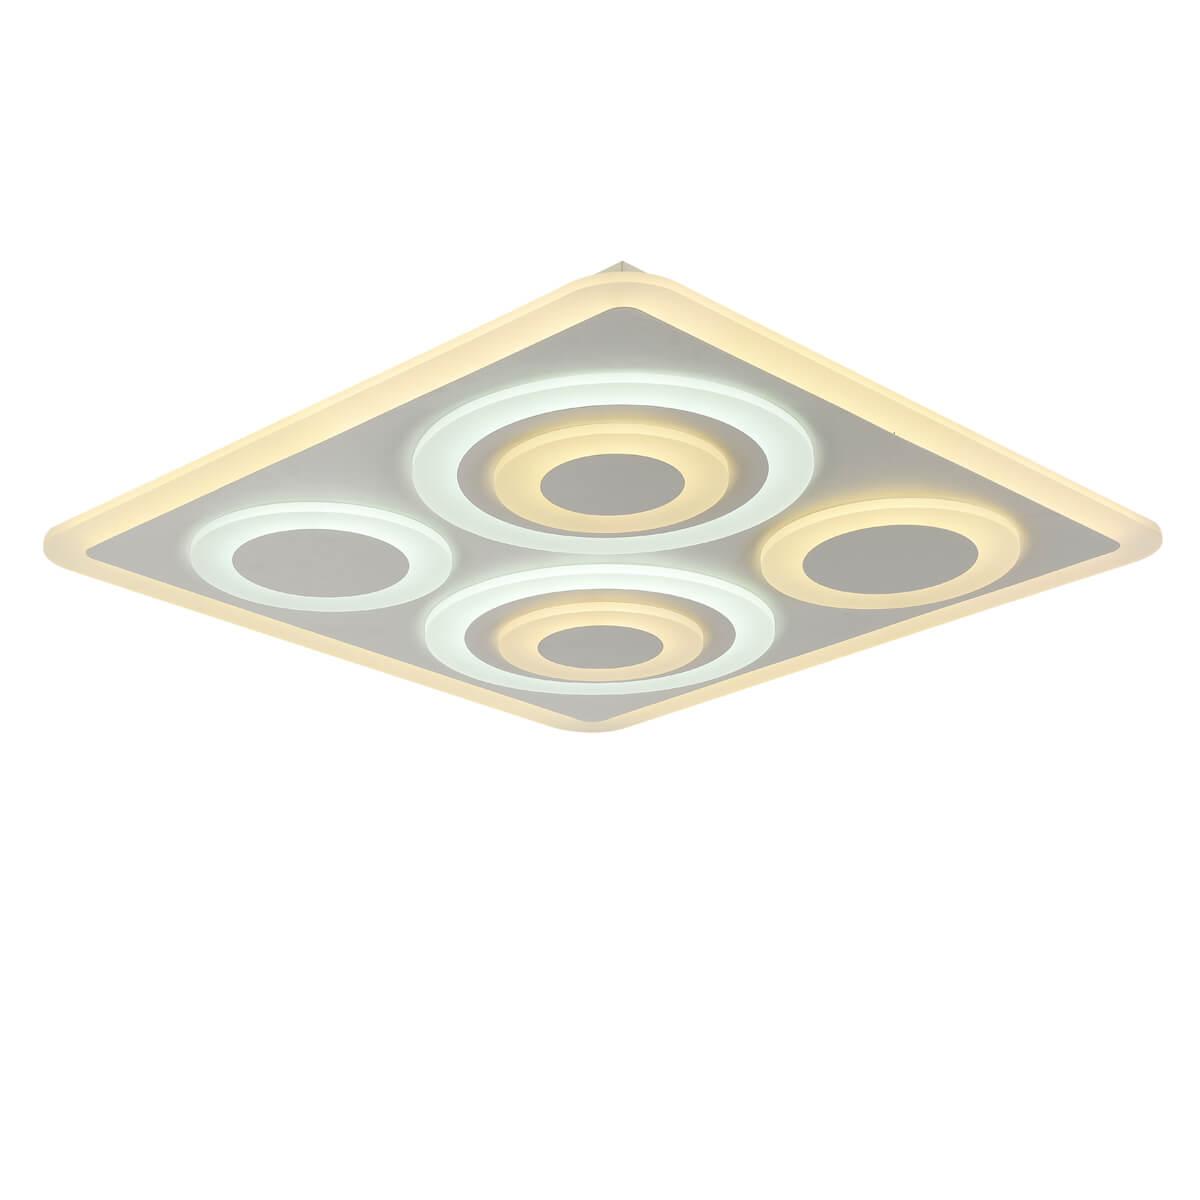 Светильник F-Promo 2280-8C Ledolution светильник natali kovaltseva 10714 8c toon